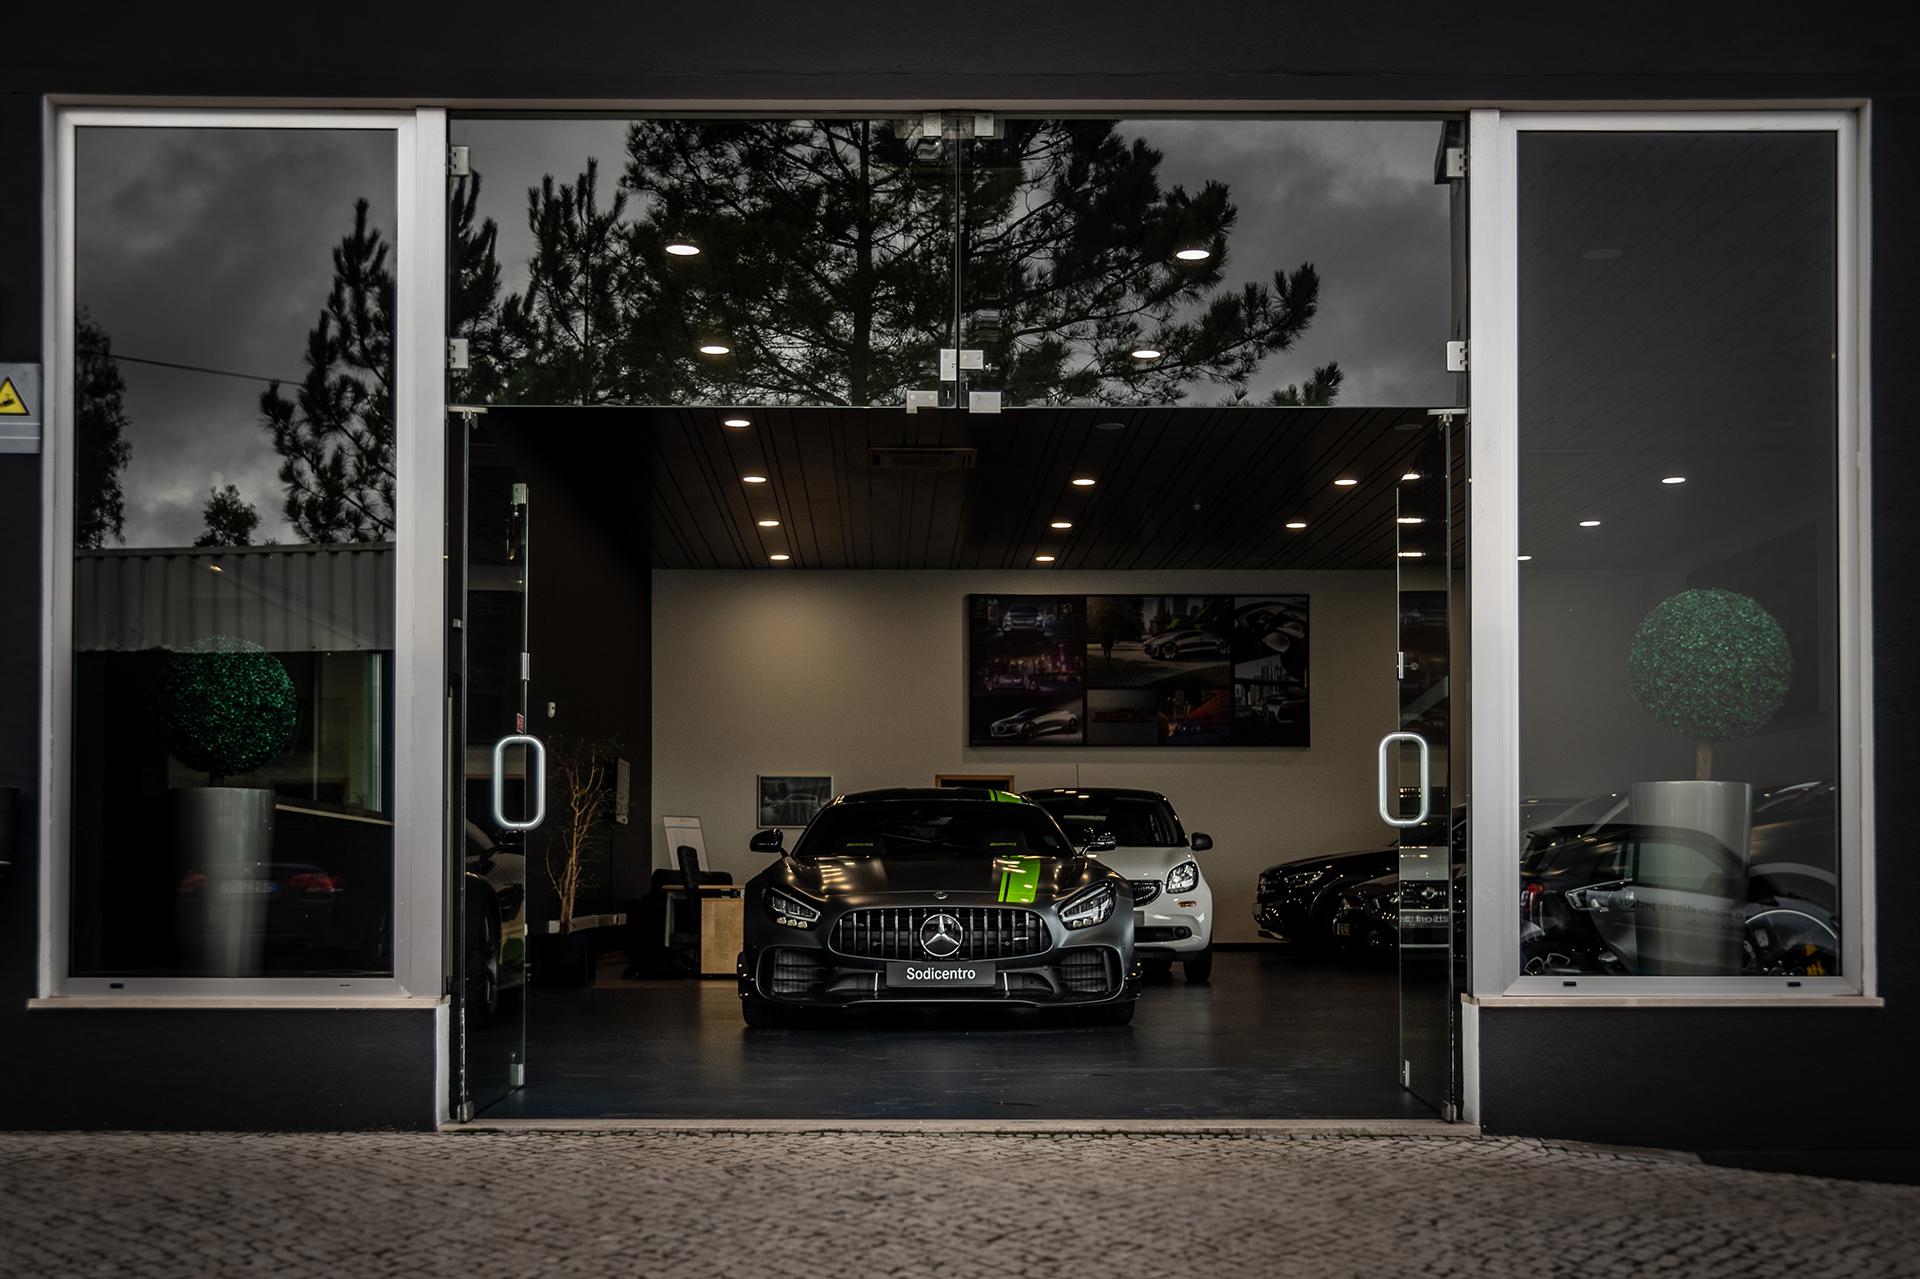 Mercedes AMG GTR Pro